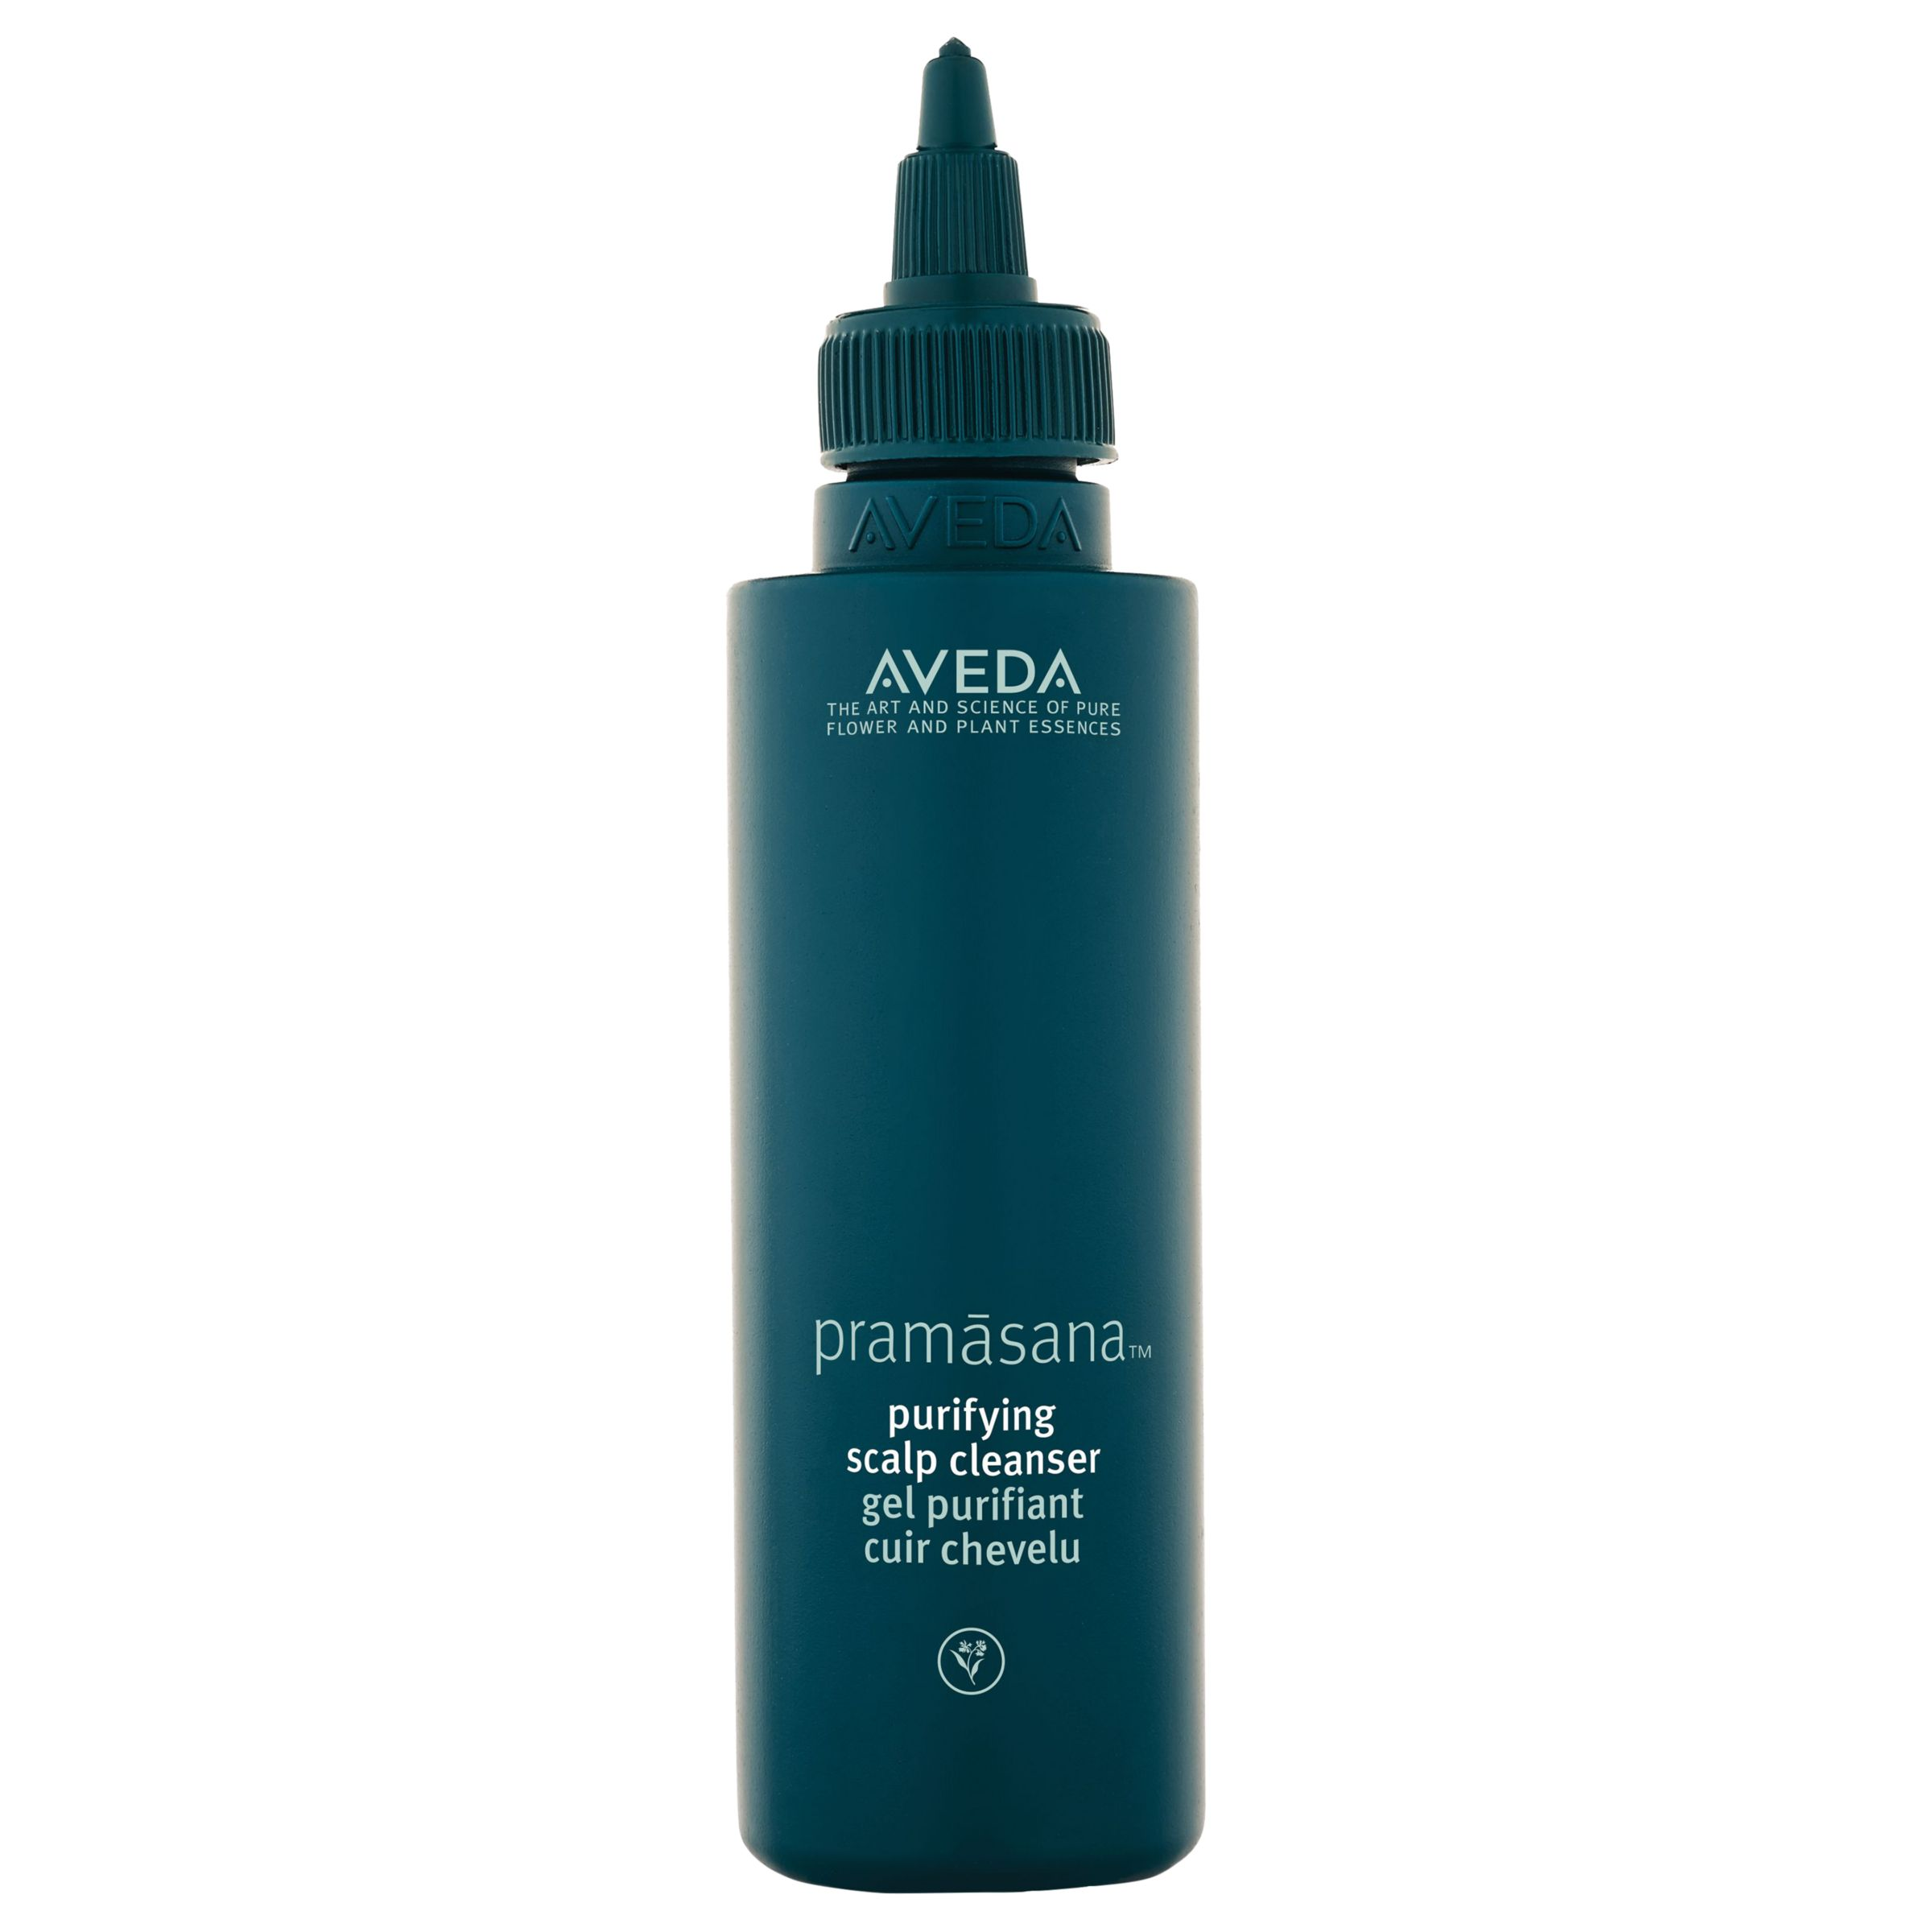 AVEDA Aveda Pramasana™ Purifying Scalp Cleanser, 150ml